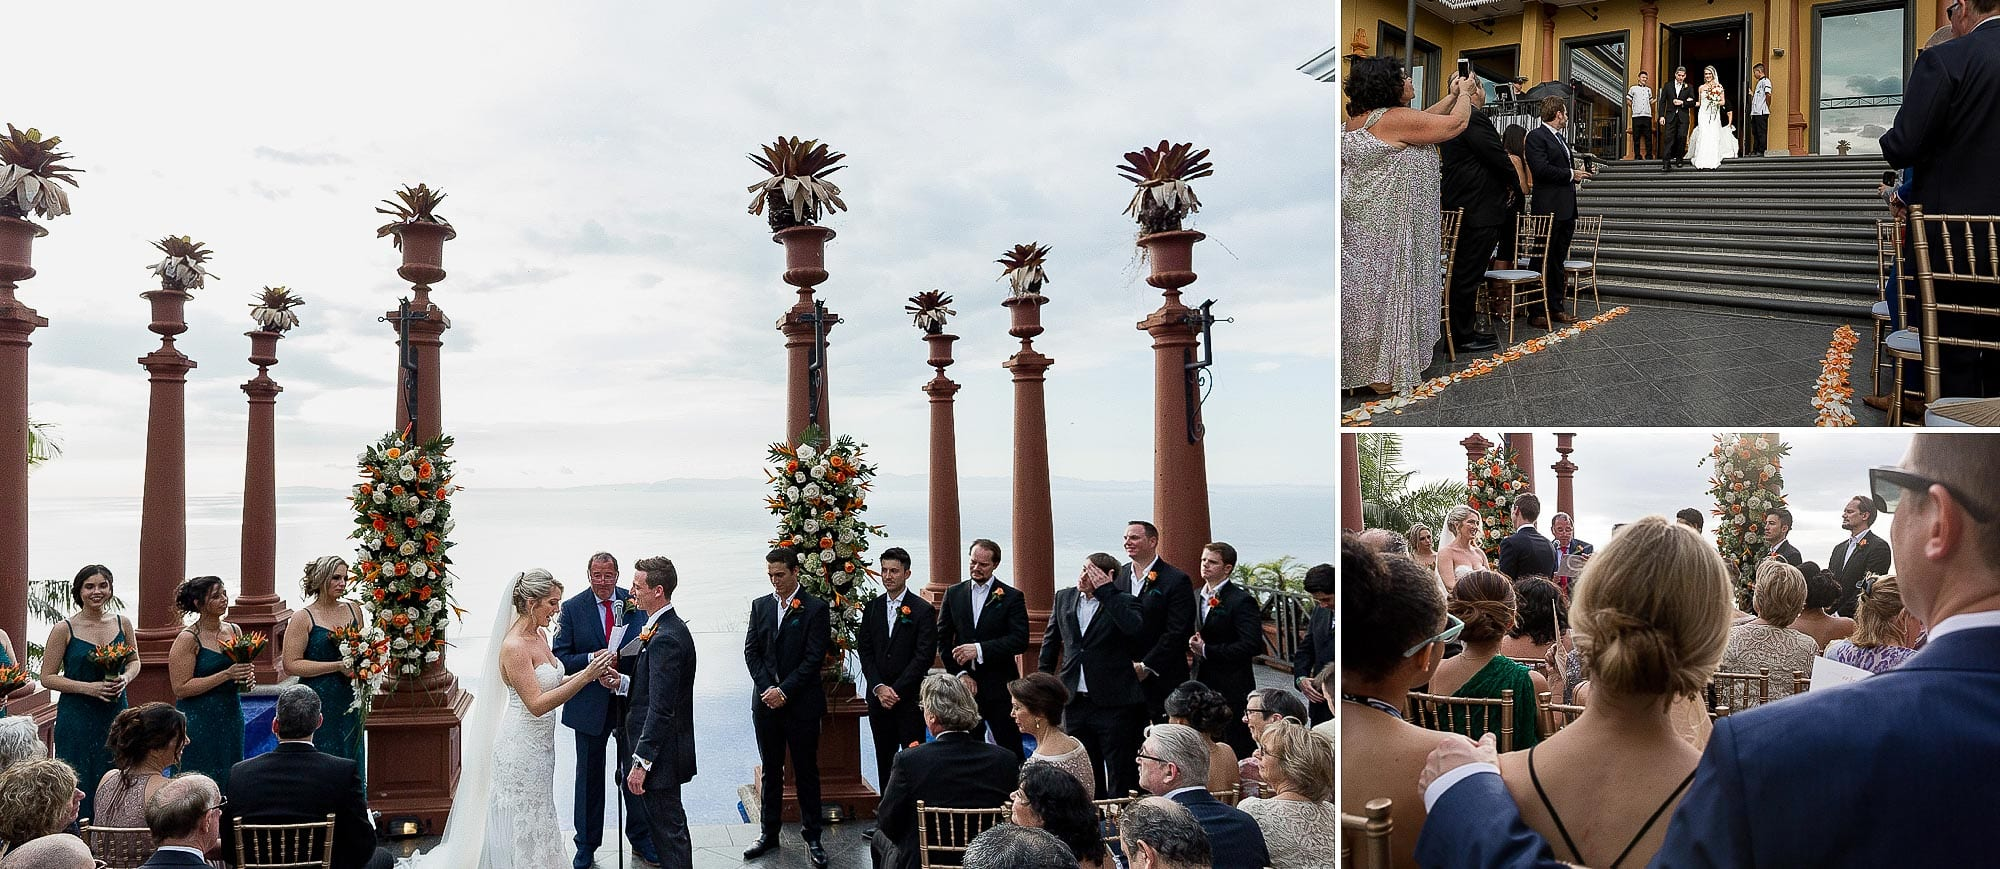 wedding ceremony zephyr palace